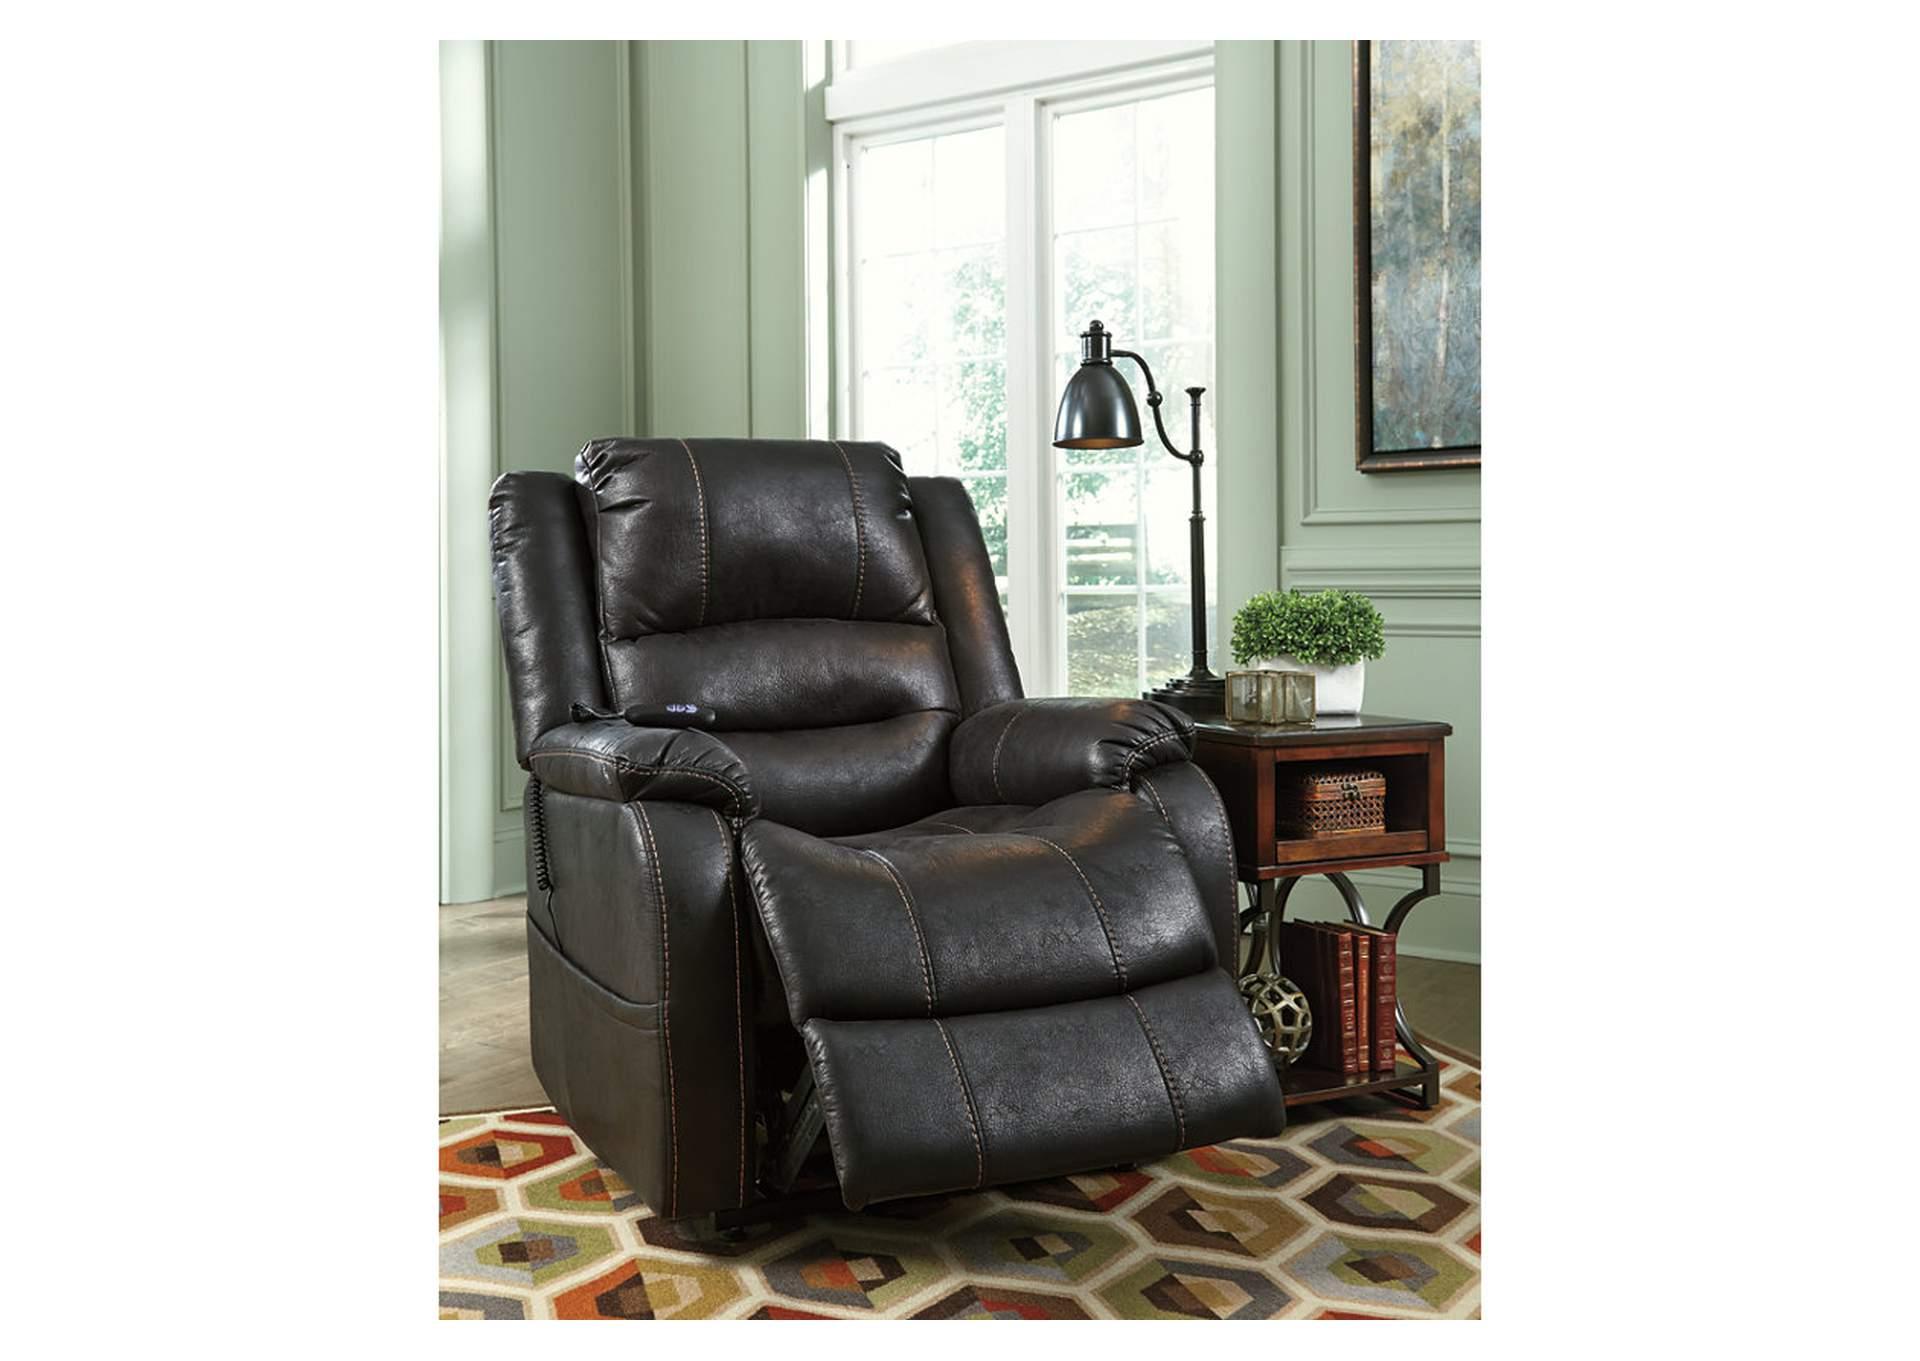 Sturzen Furniture Yandel Black Power Lift Recliner